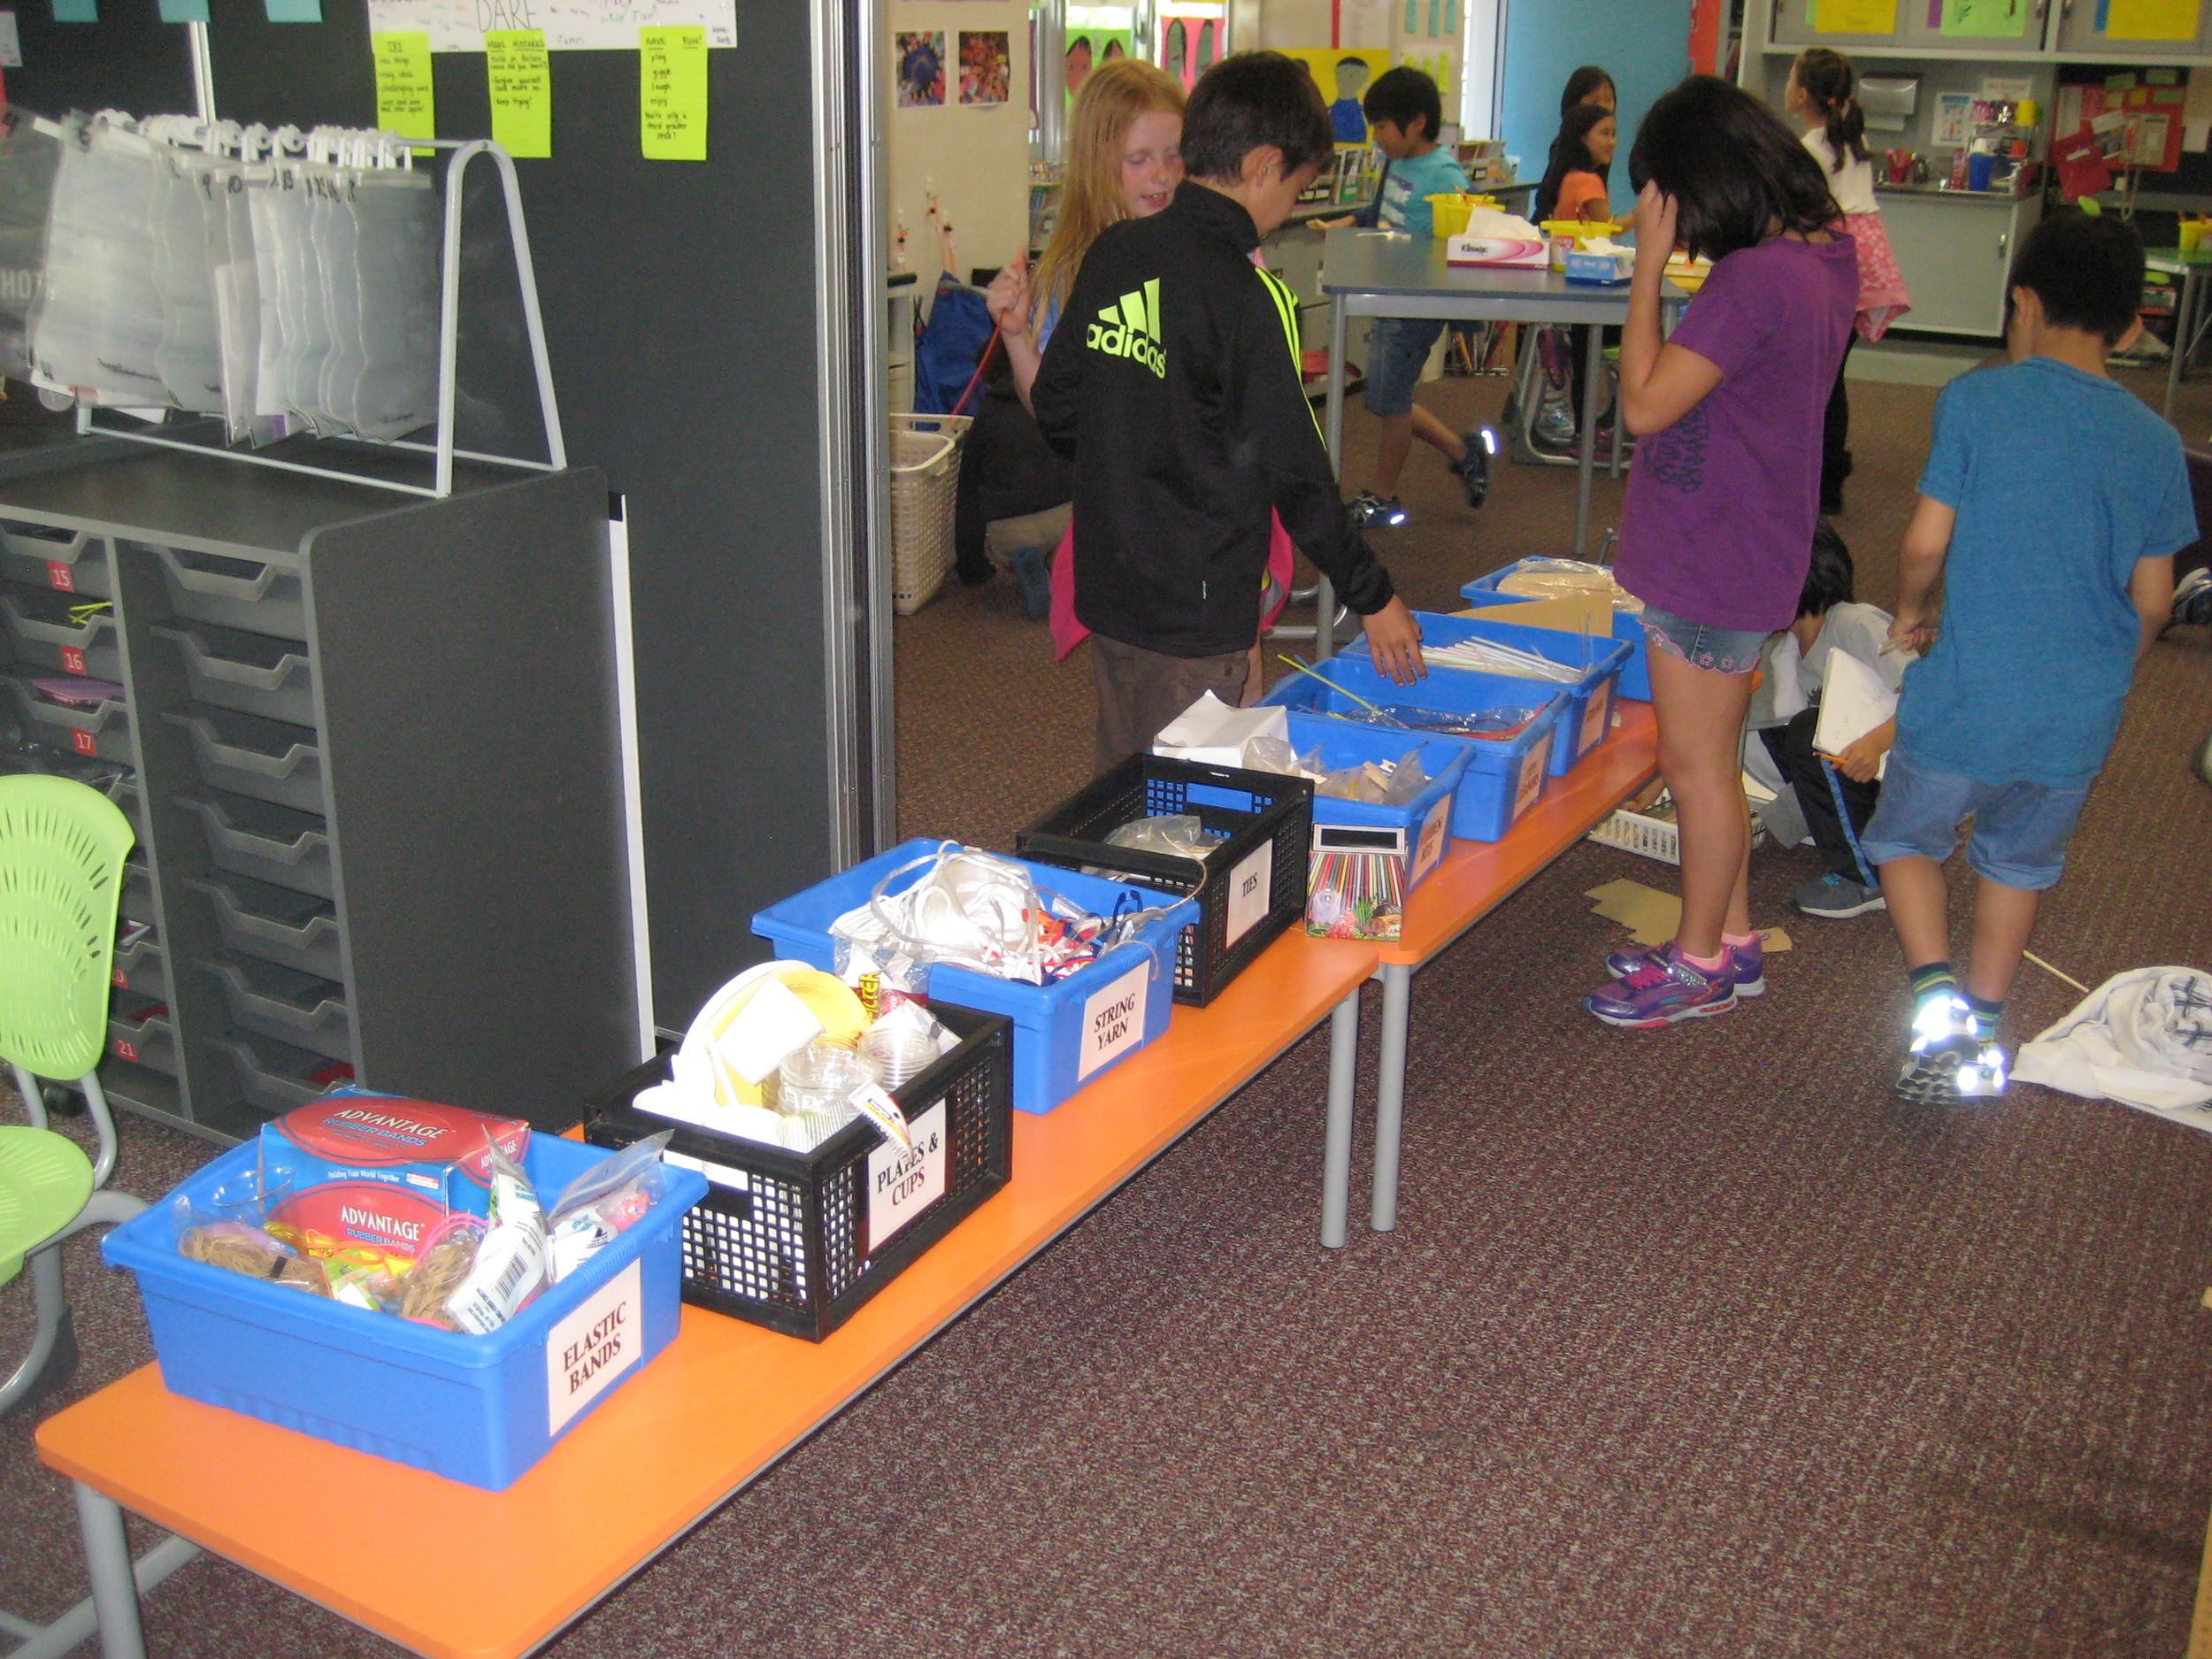 Students look at materials